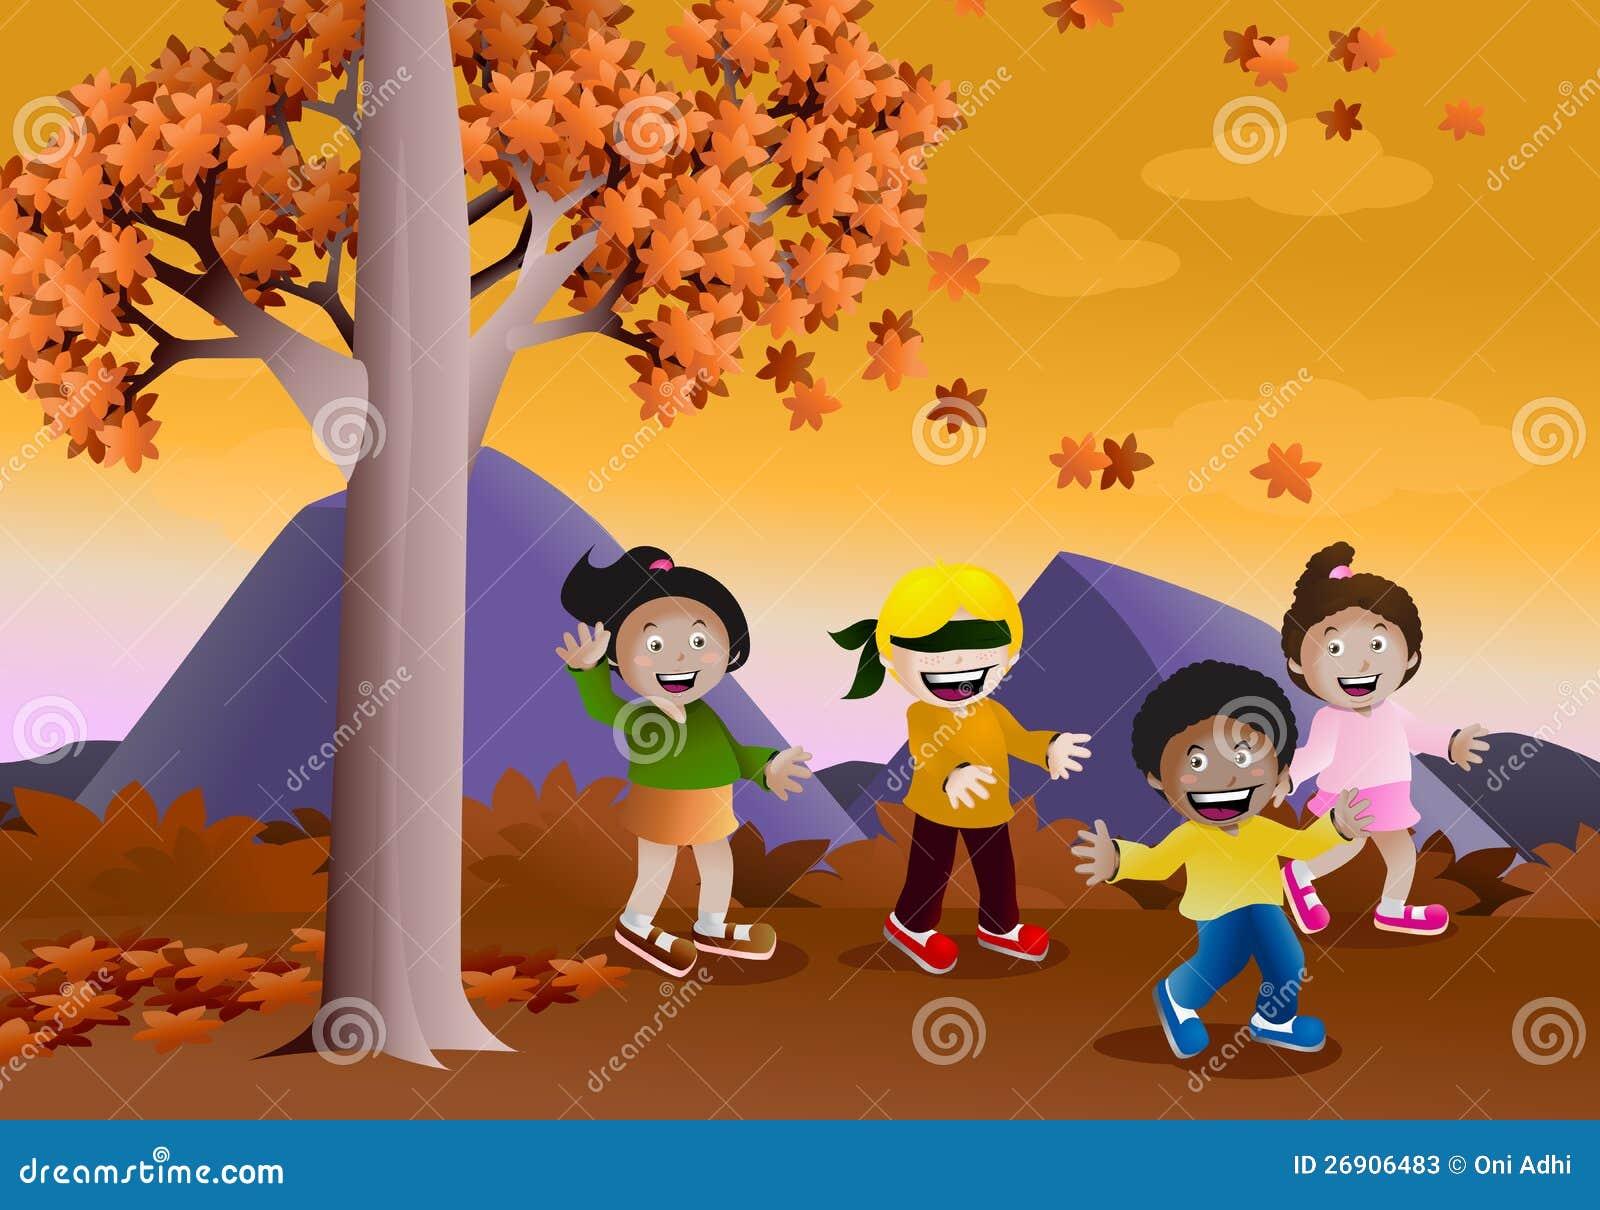 Hide Seek Kids: Playing Hide And Seek Game In Autumn Stock Photos